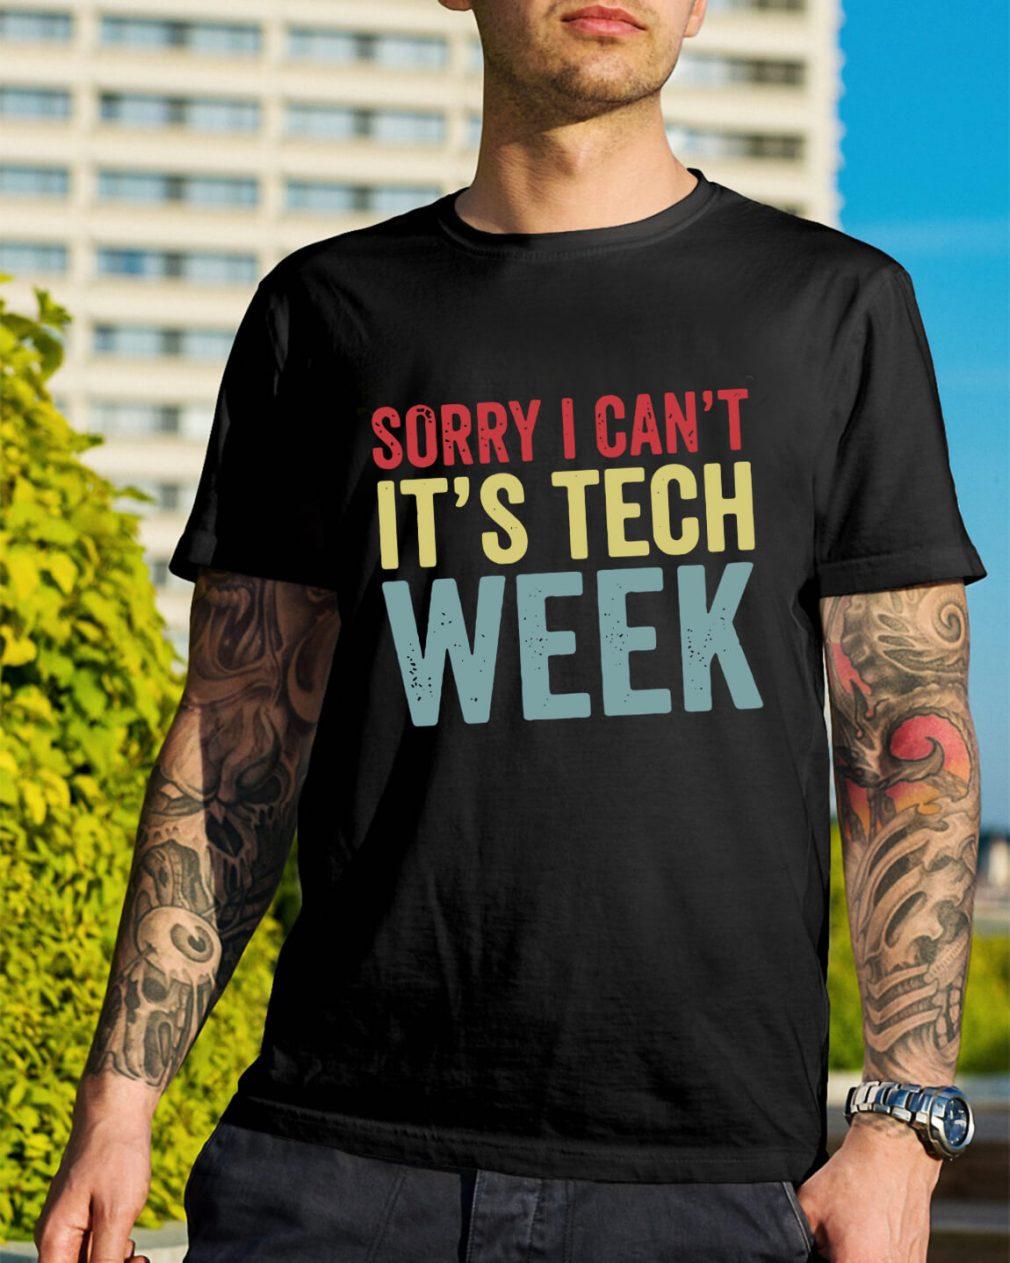 Sorry I can't it's tech week shirt